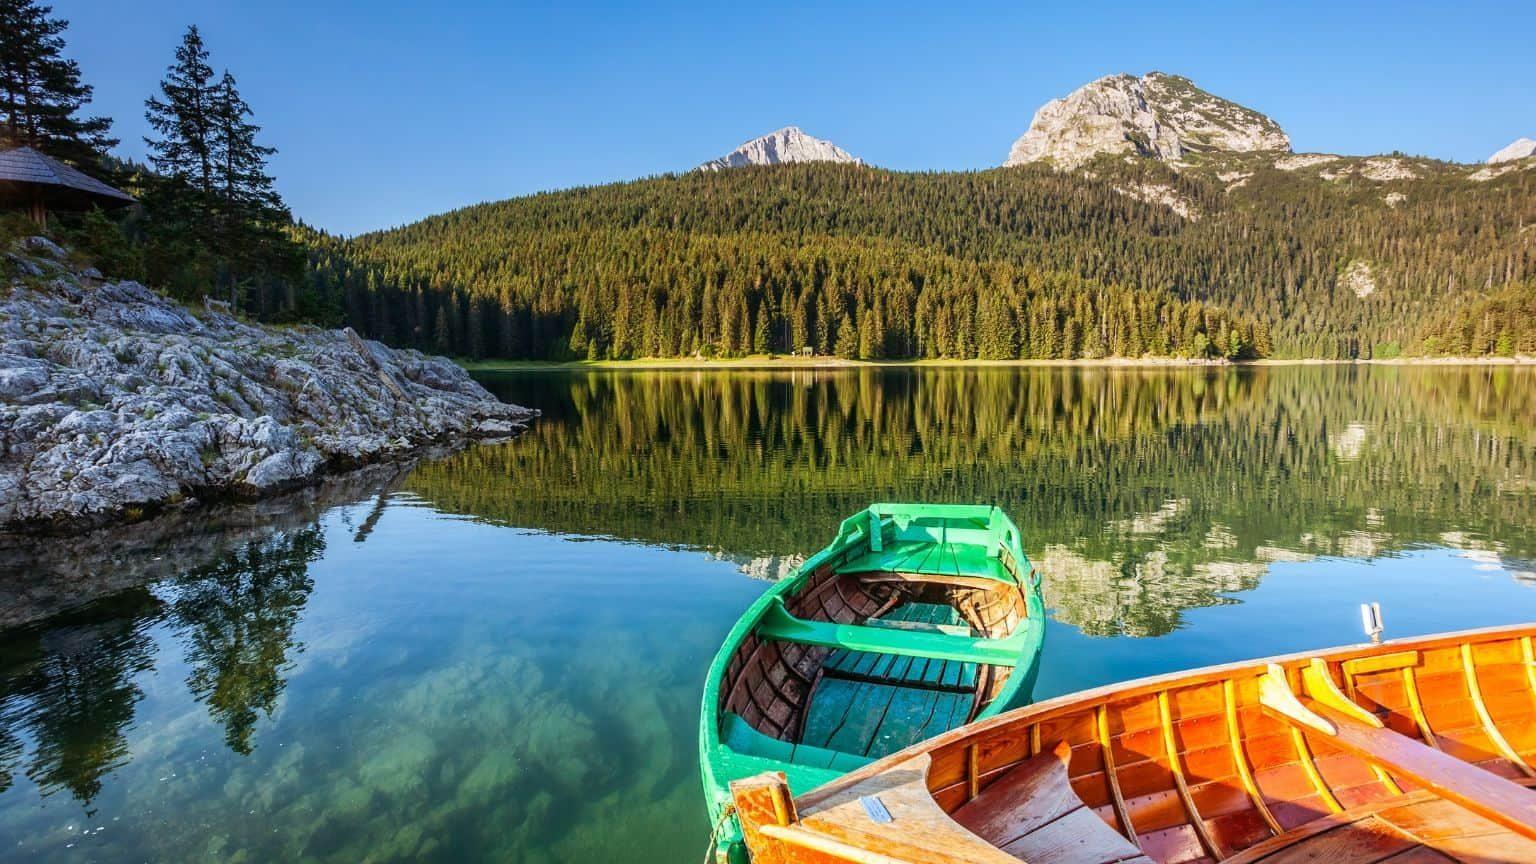 Black Lake in the Balkans